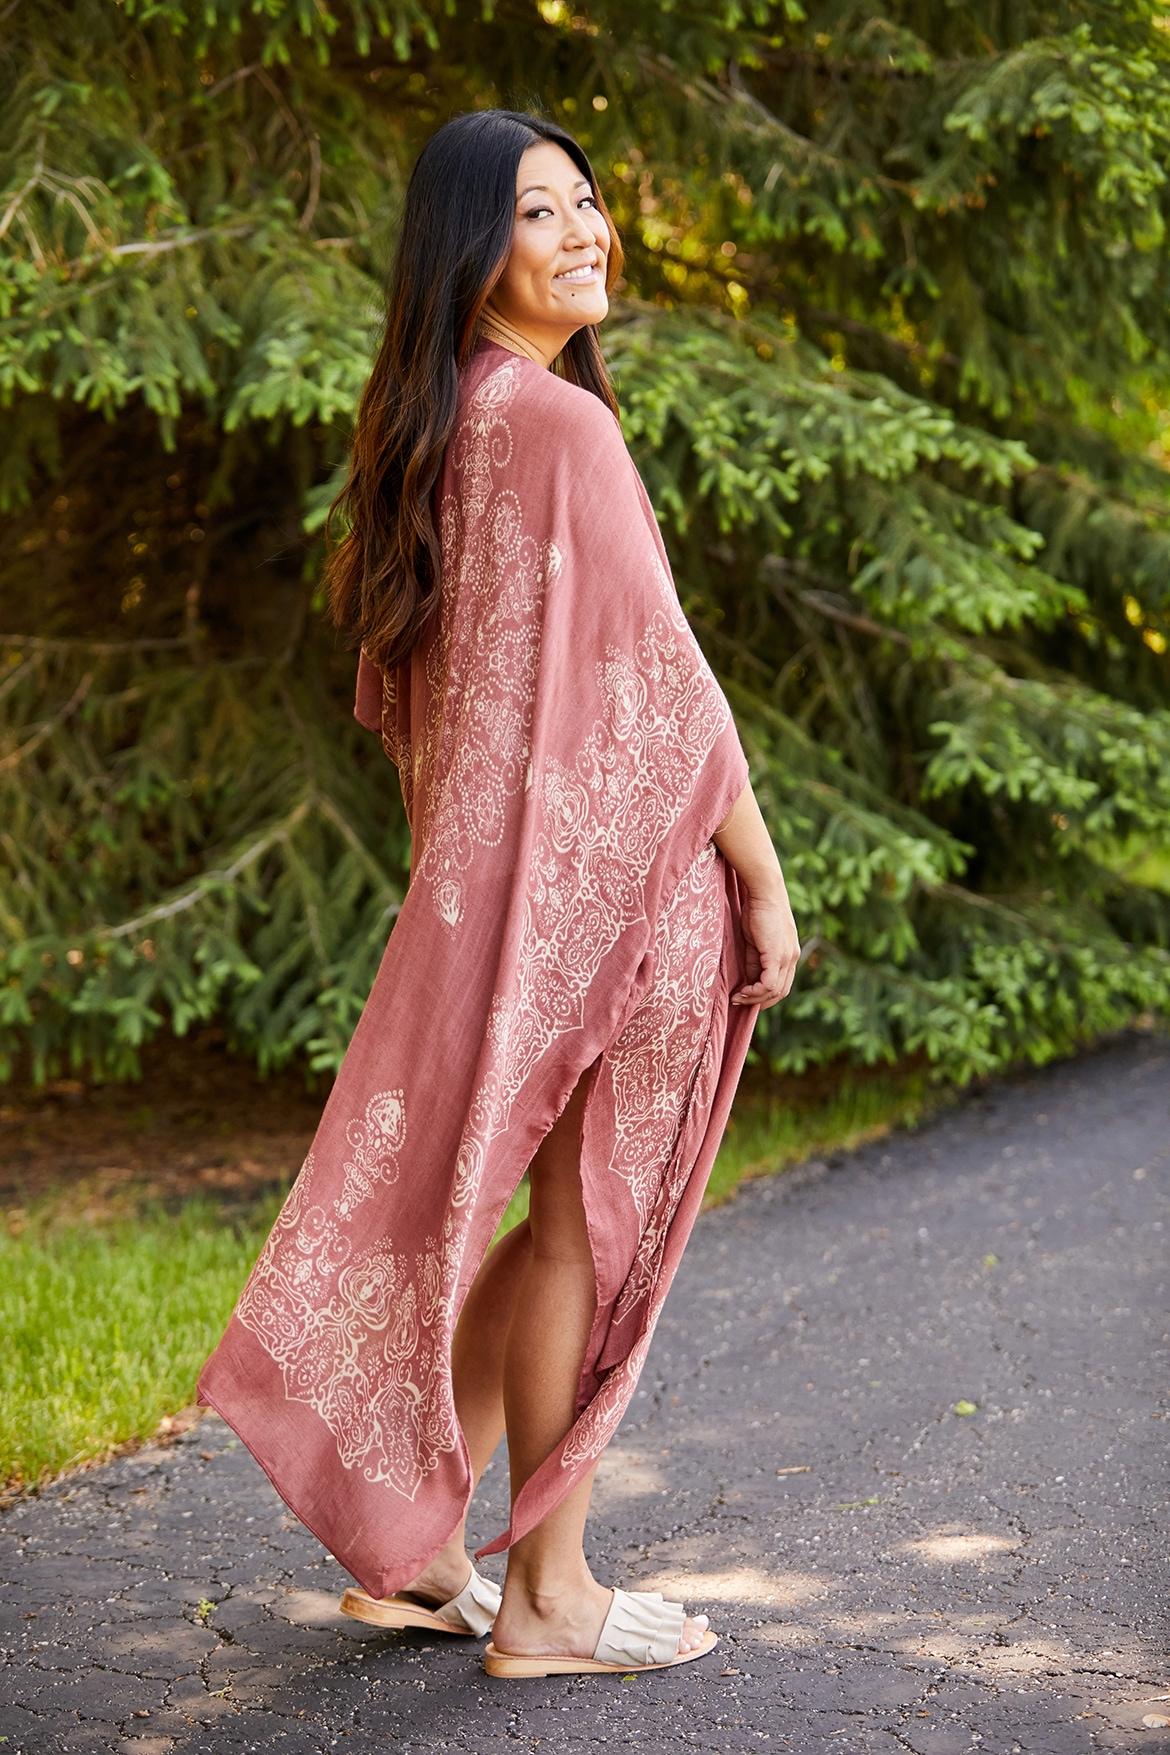 kimono and shorts for summer